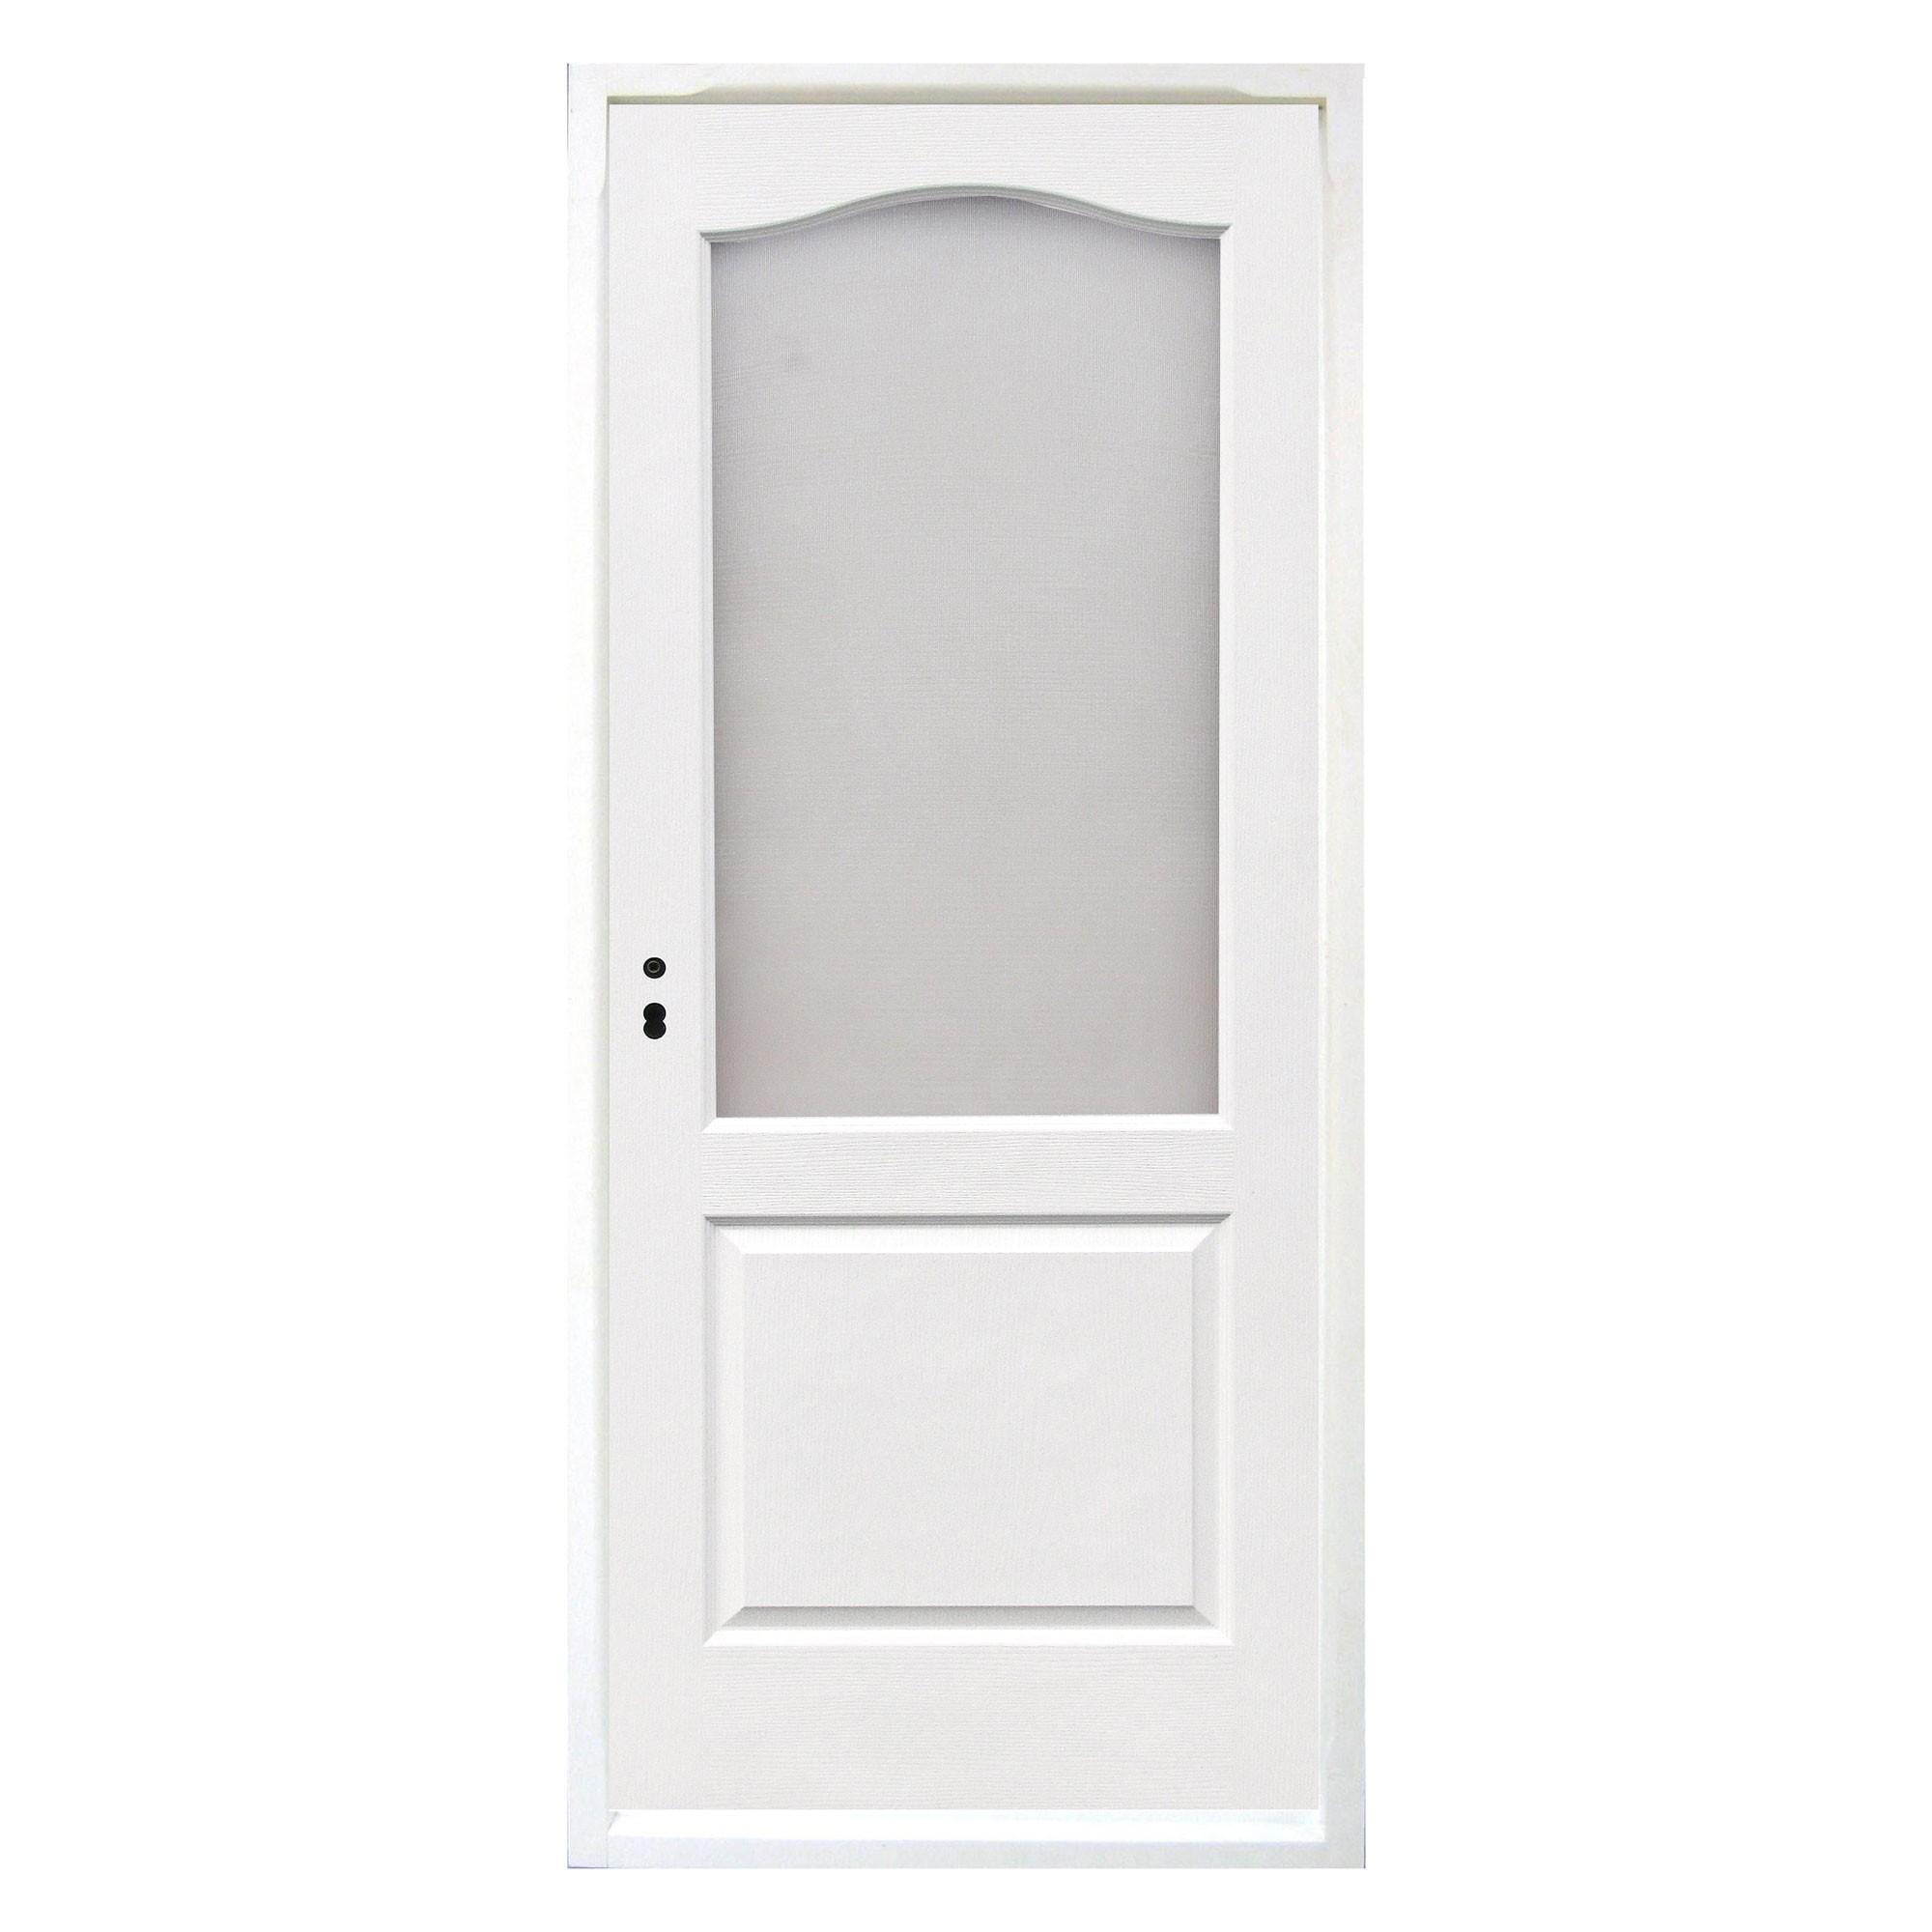 Dedeman Usa Interior Celulara Cu Geam Eco Euro Doors Dreapta Alb